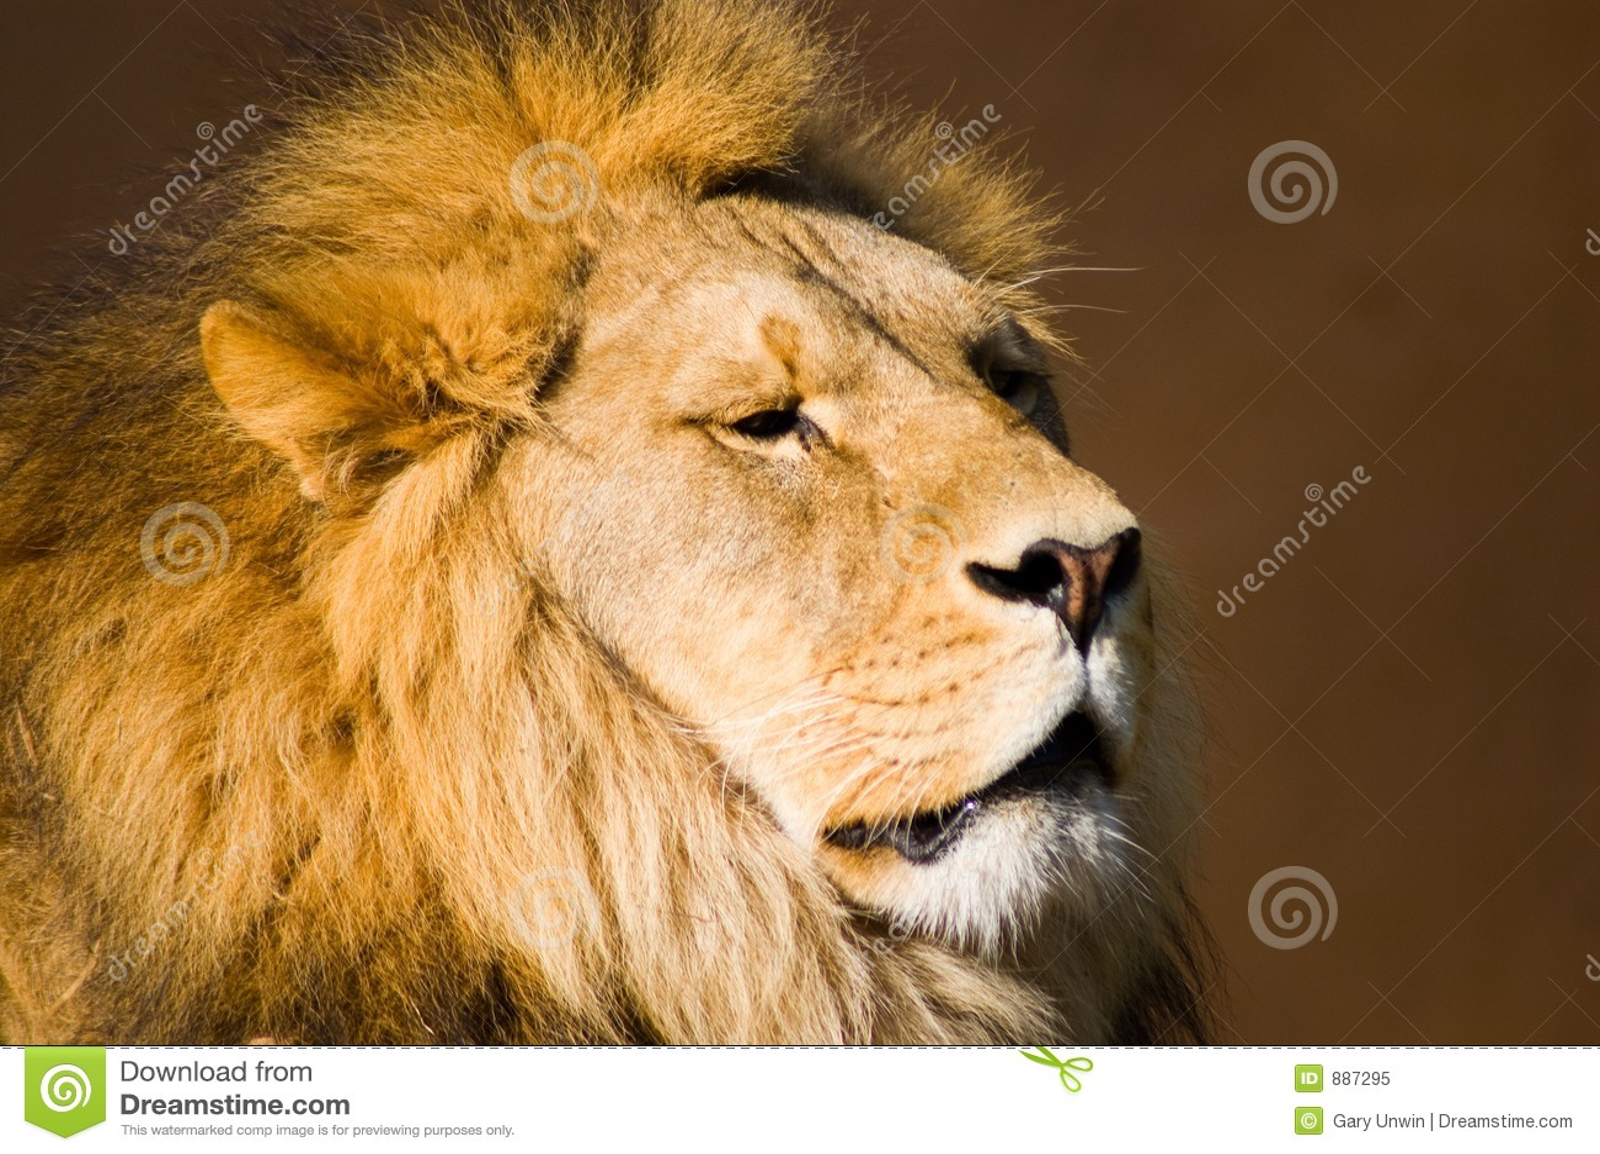 Lion head - photo#27